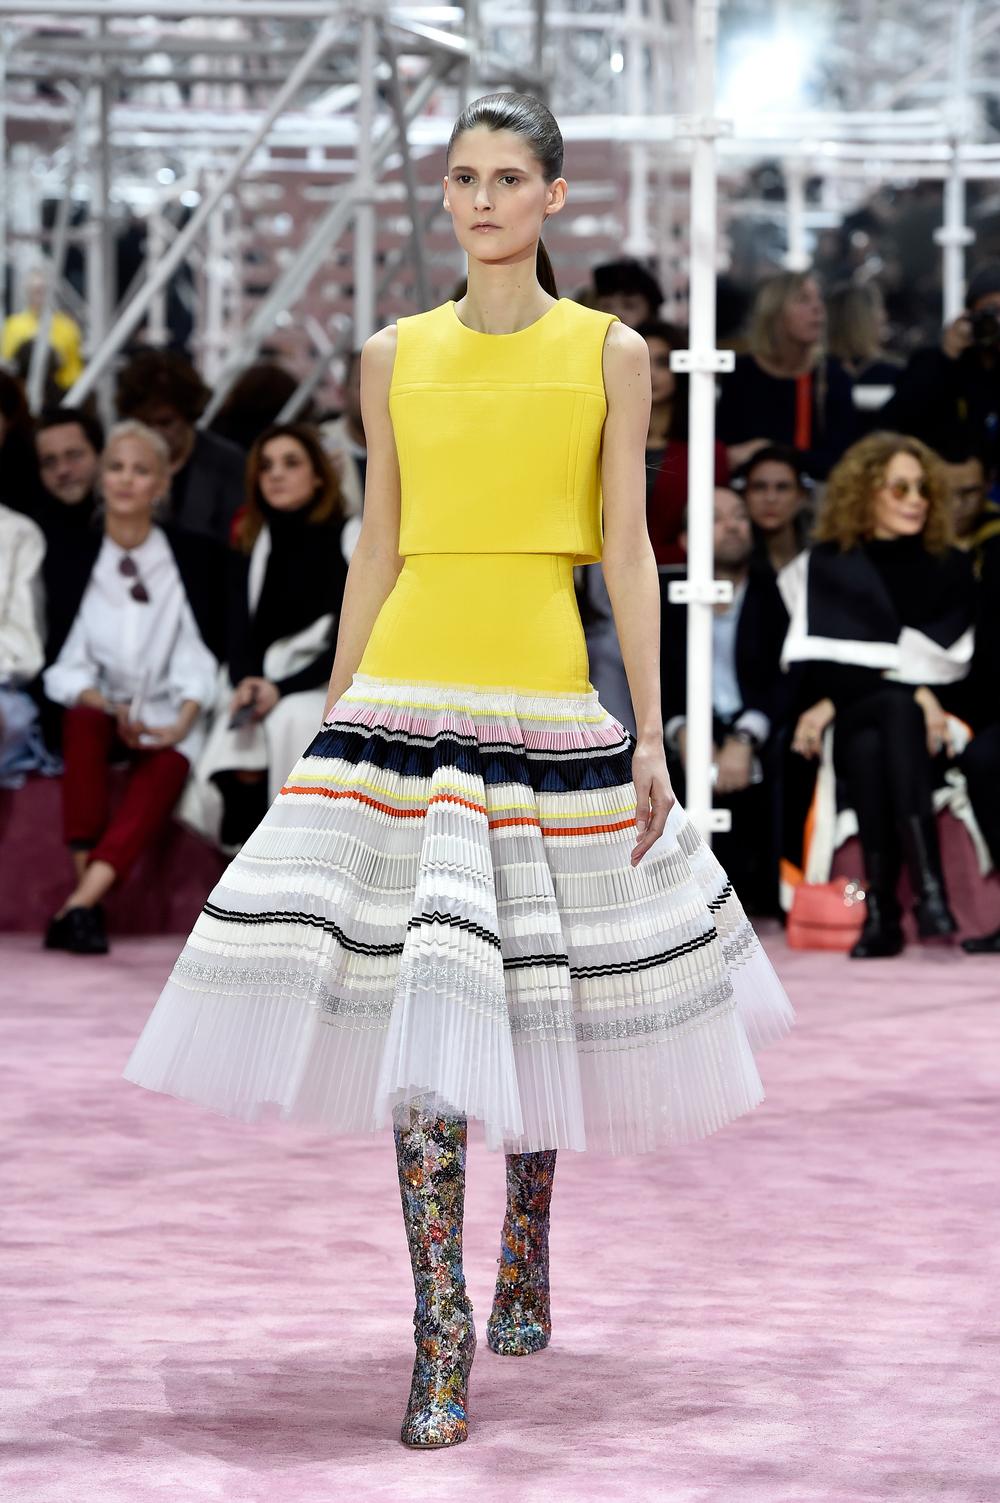 christian-dior-haute-couture-spring-summer-2015-paris-462275056.jpg